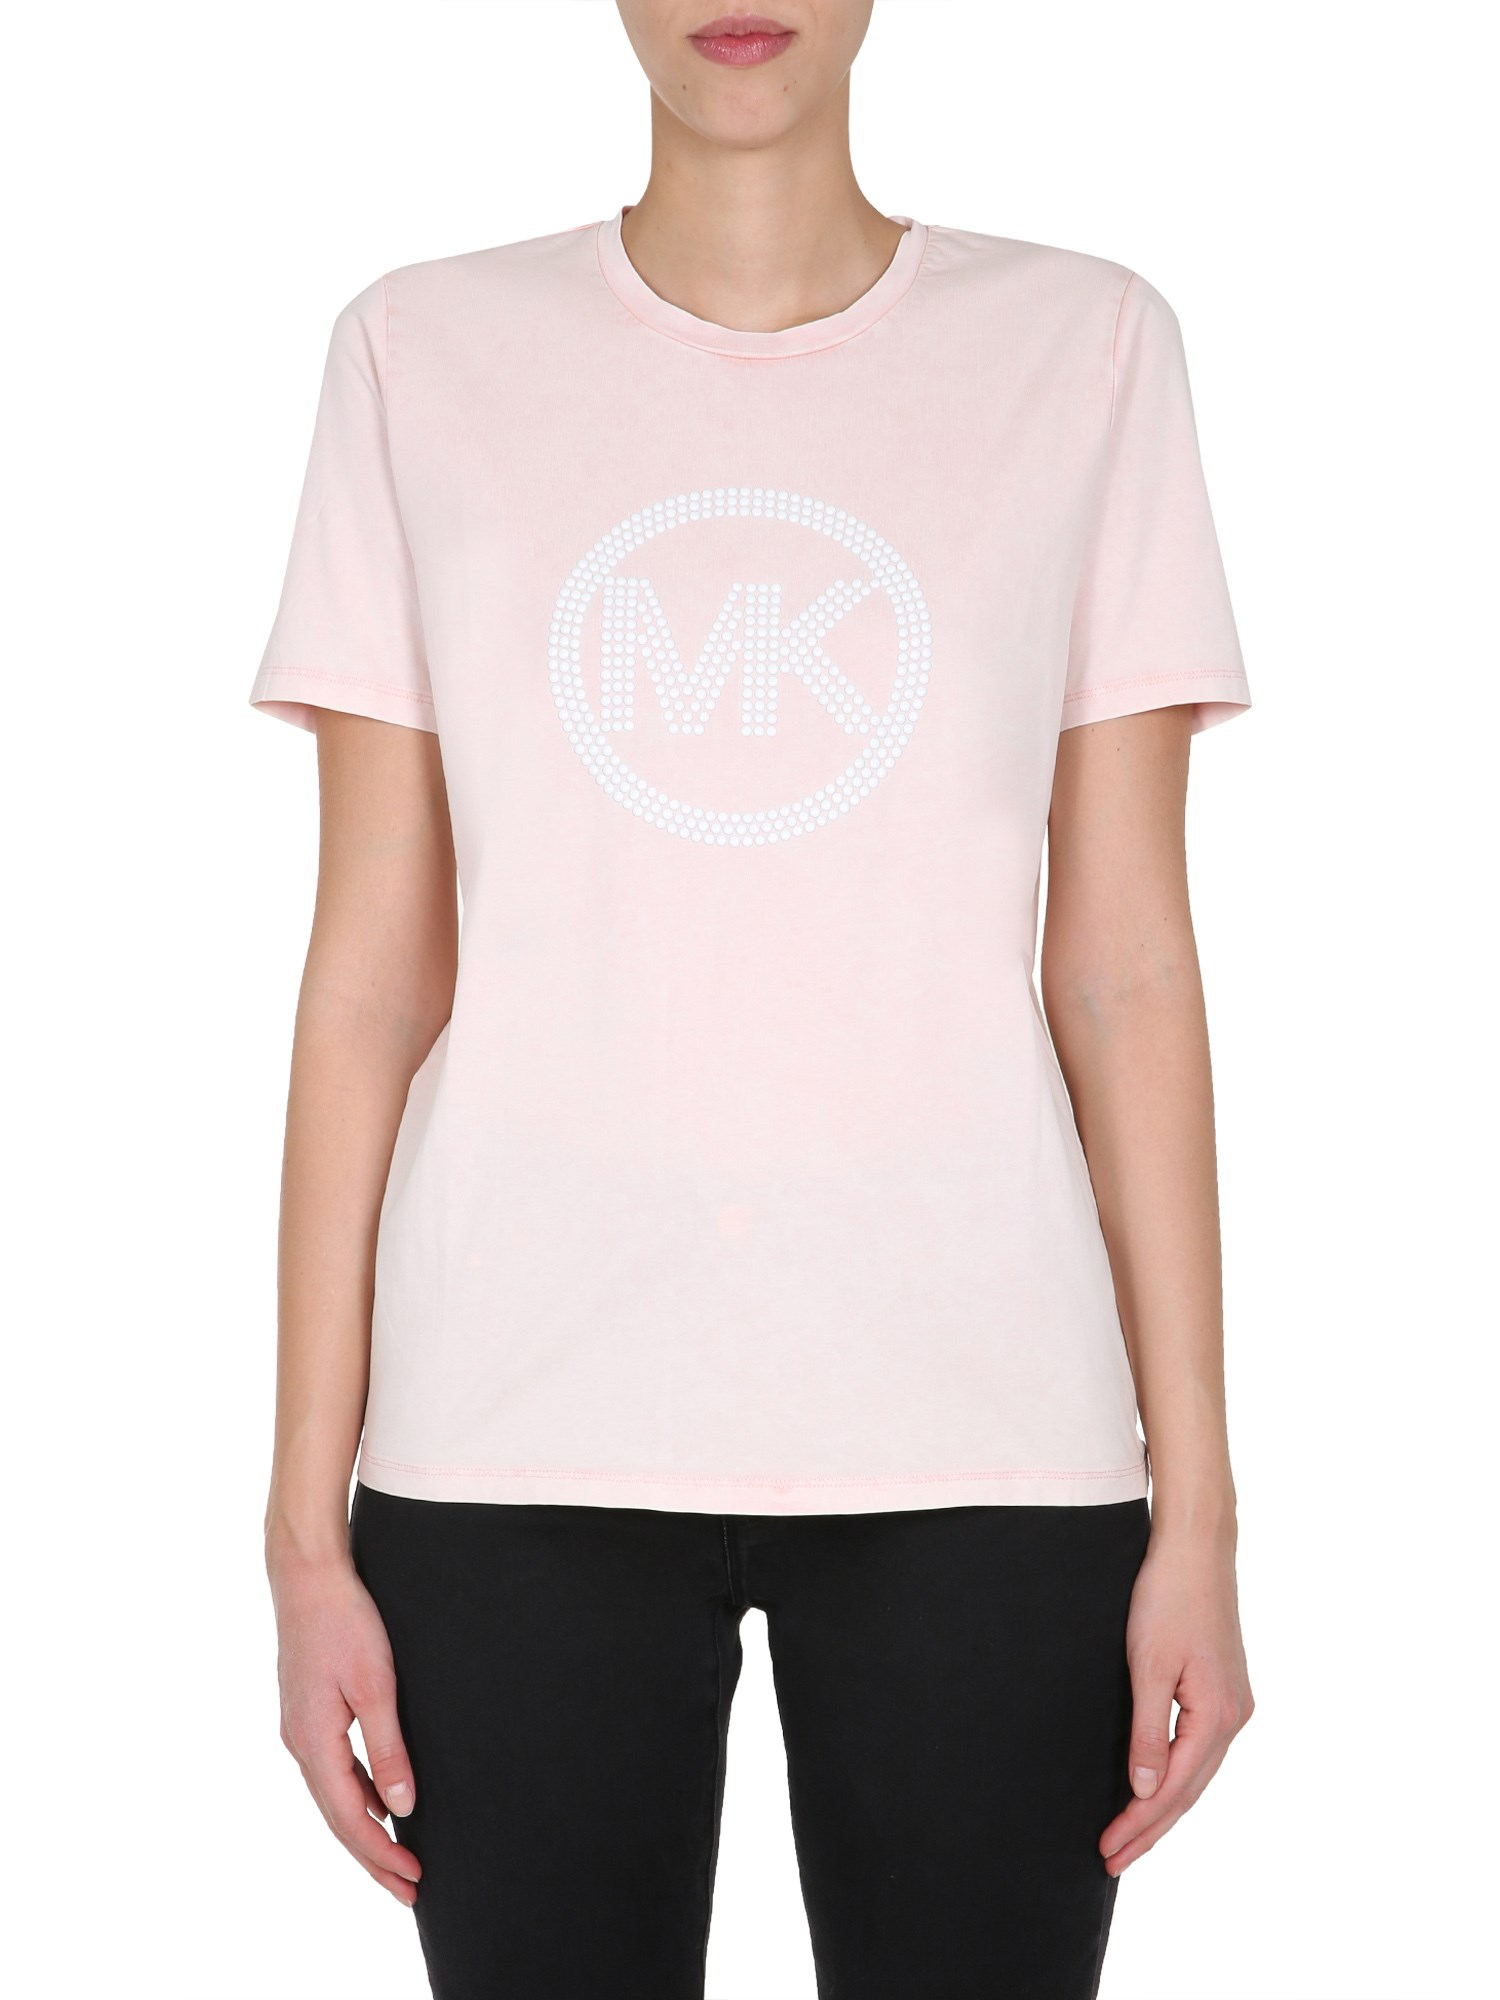 michael by michael kors round neck t-shirt